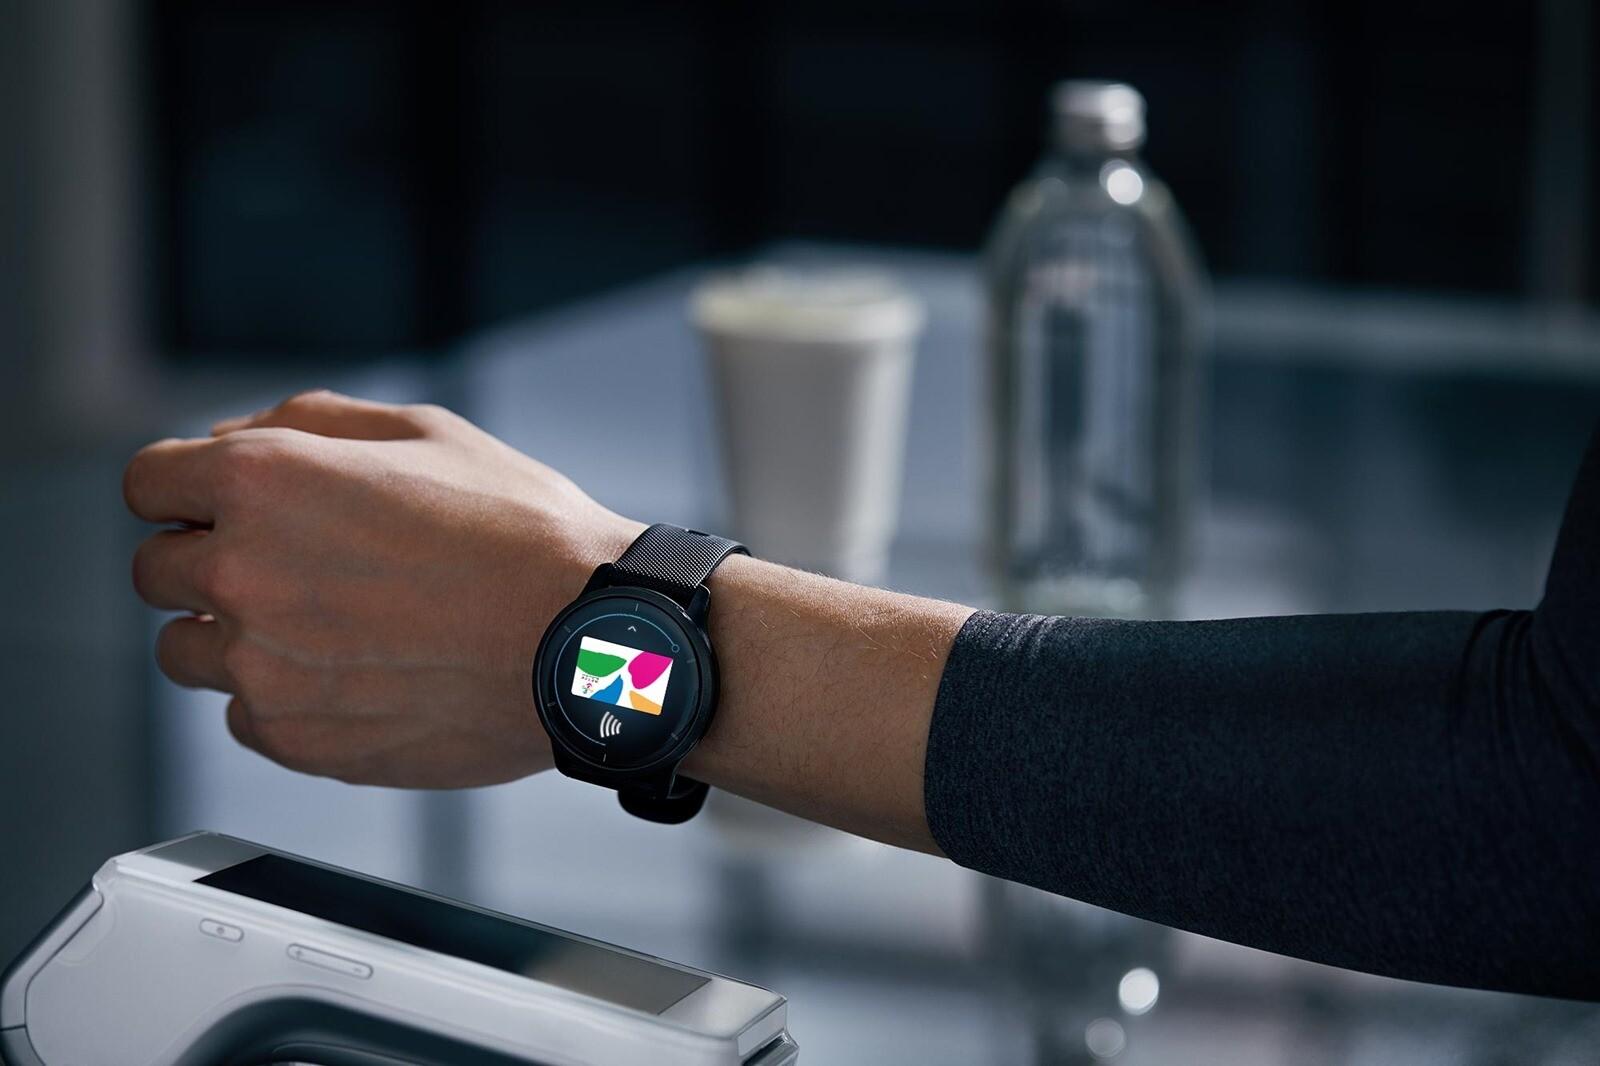 「VENU-2 系列 GPS 智慧腕錶」內建多項智慧提示、悠遊卡及 Garmin-Pay 行動支付,減少接觸風險、保護大家的健康,讓你輕鬆掌握健康便利又安全的生活.jpg @3C 達人廖阿輝